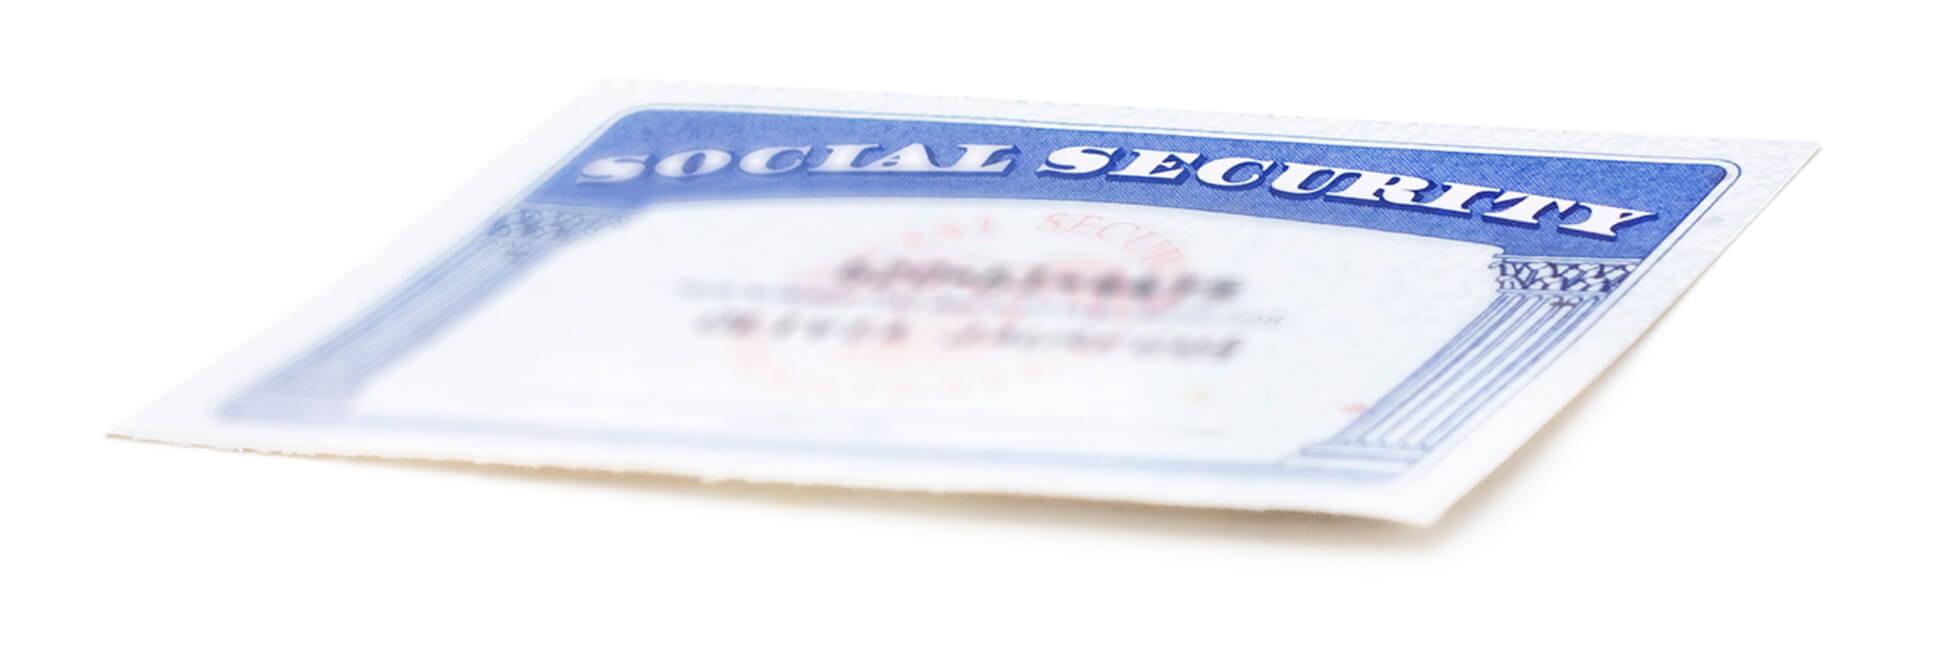 Maximize Social Security Benefits - LifePro Asset Management